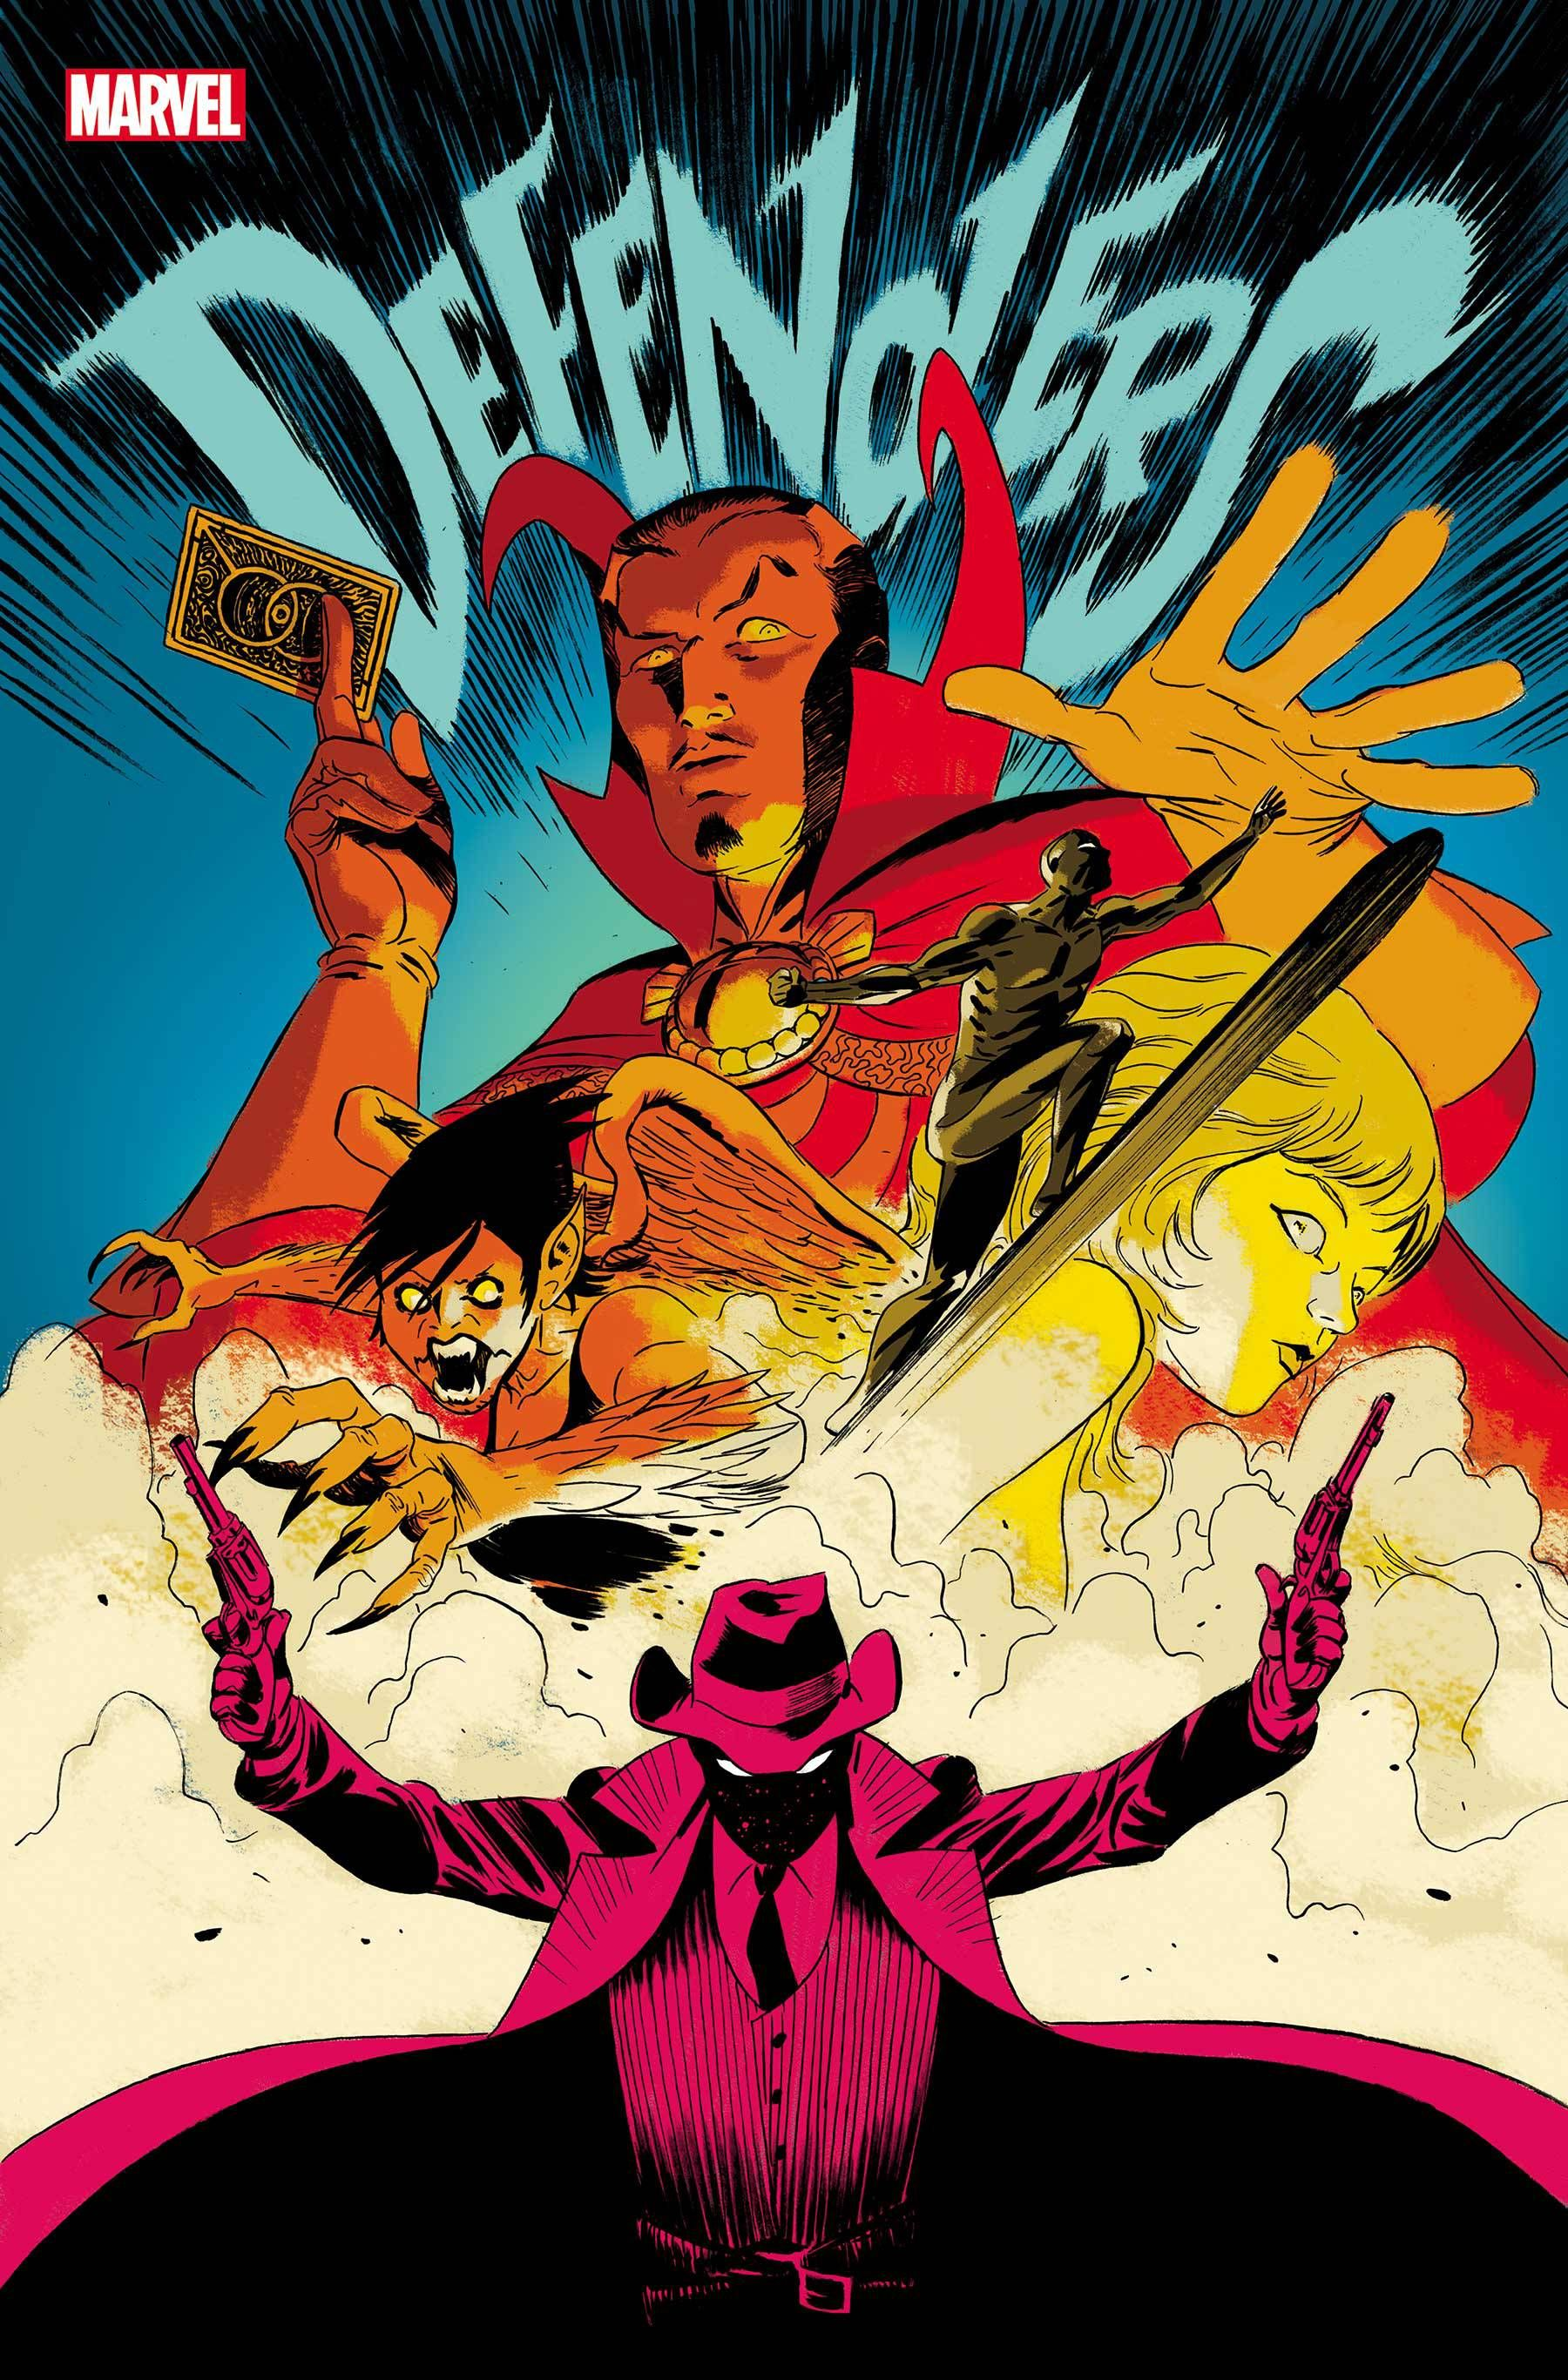 eyJidWNrZXQiOiJnb2NvbGxlY3QuaW1hZ2VzLnB1YiIsImtleSI6IjYyZDI5YTg3LTNmNTgtNDhjYi1hNTc2LTkwMWVjZWY3NTIzNi5qcGciLCJlZGl0cyI6W119 ComicList: Marvel Comics New Releases for 08/11/2021